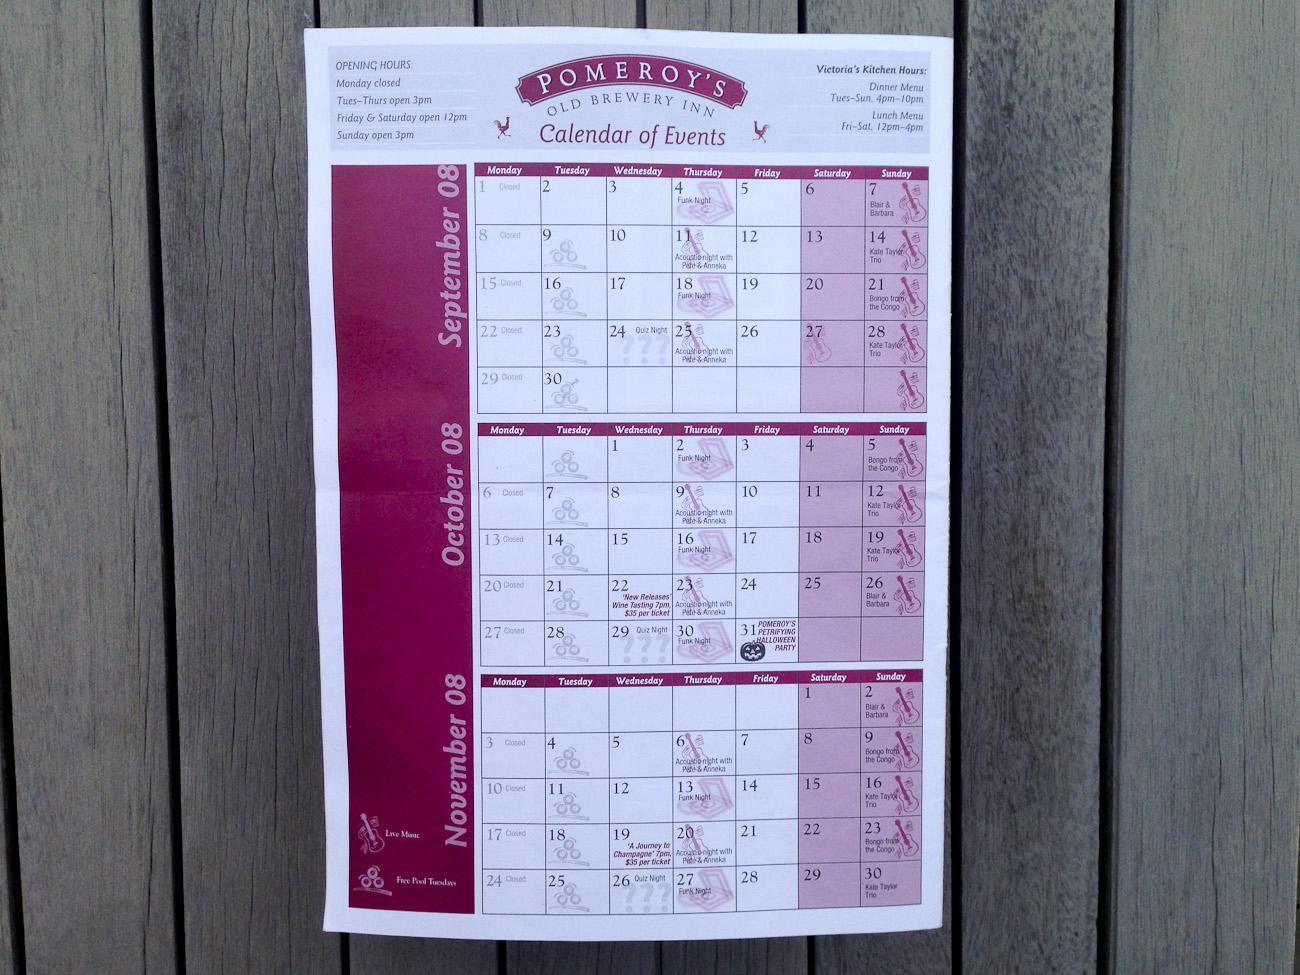 Pomeroy's Press, 3 month Calendar of Events.